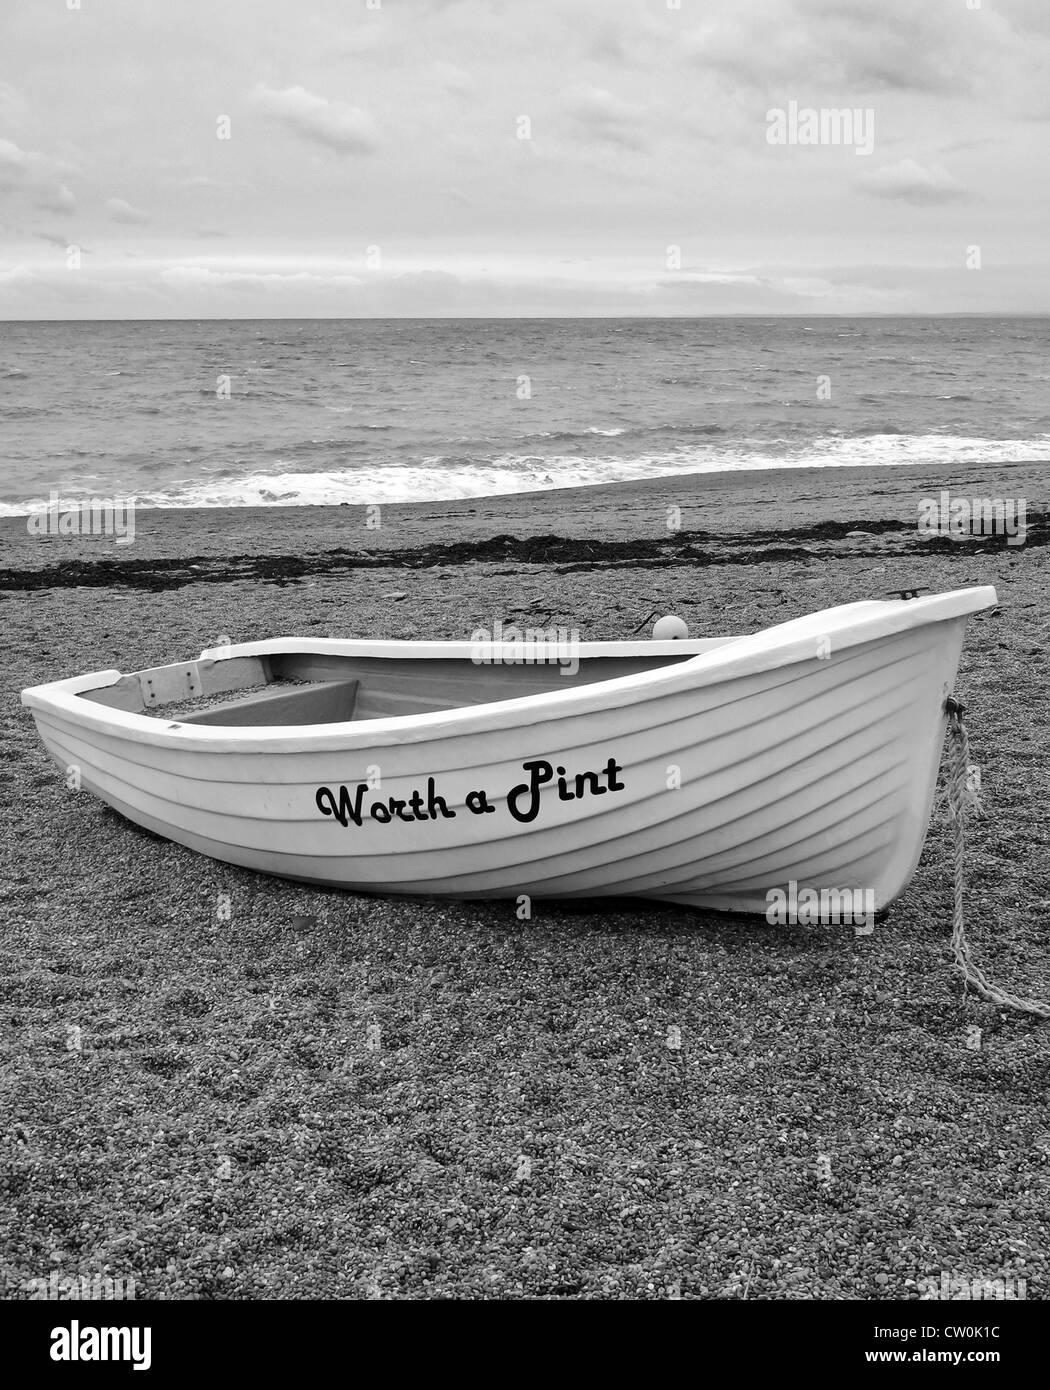 "Boat ""Worth a Pint"" on Burton Bradstock beach, Dorset, UK - Stock Image"